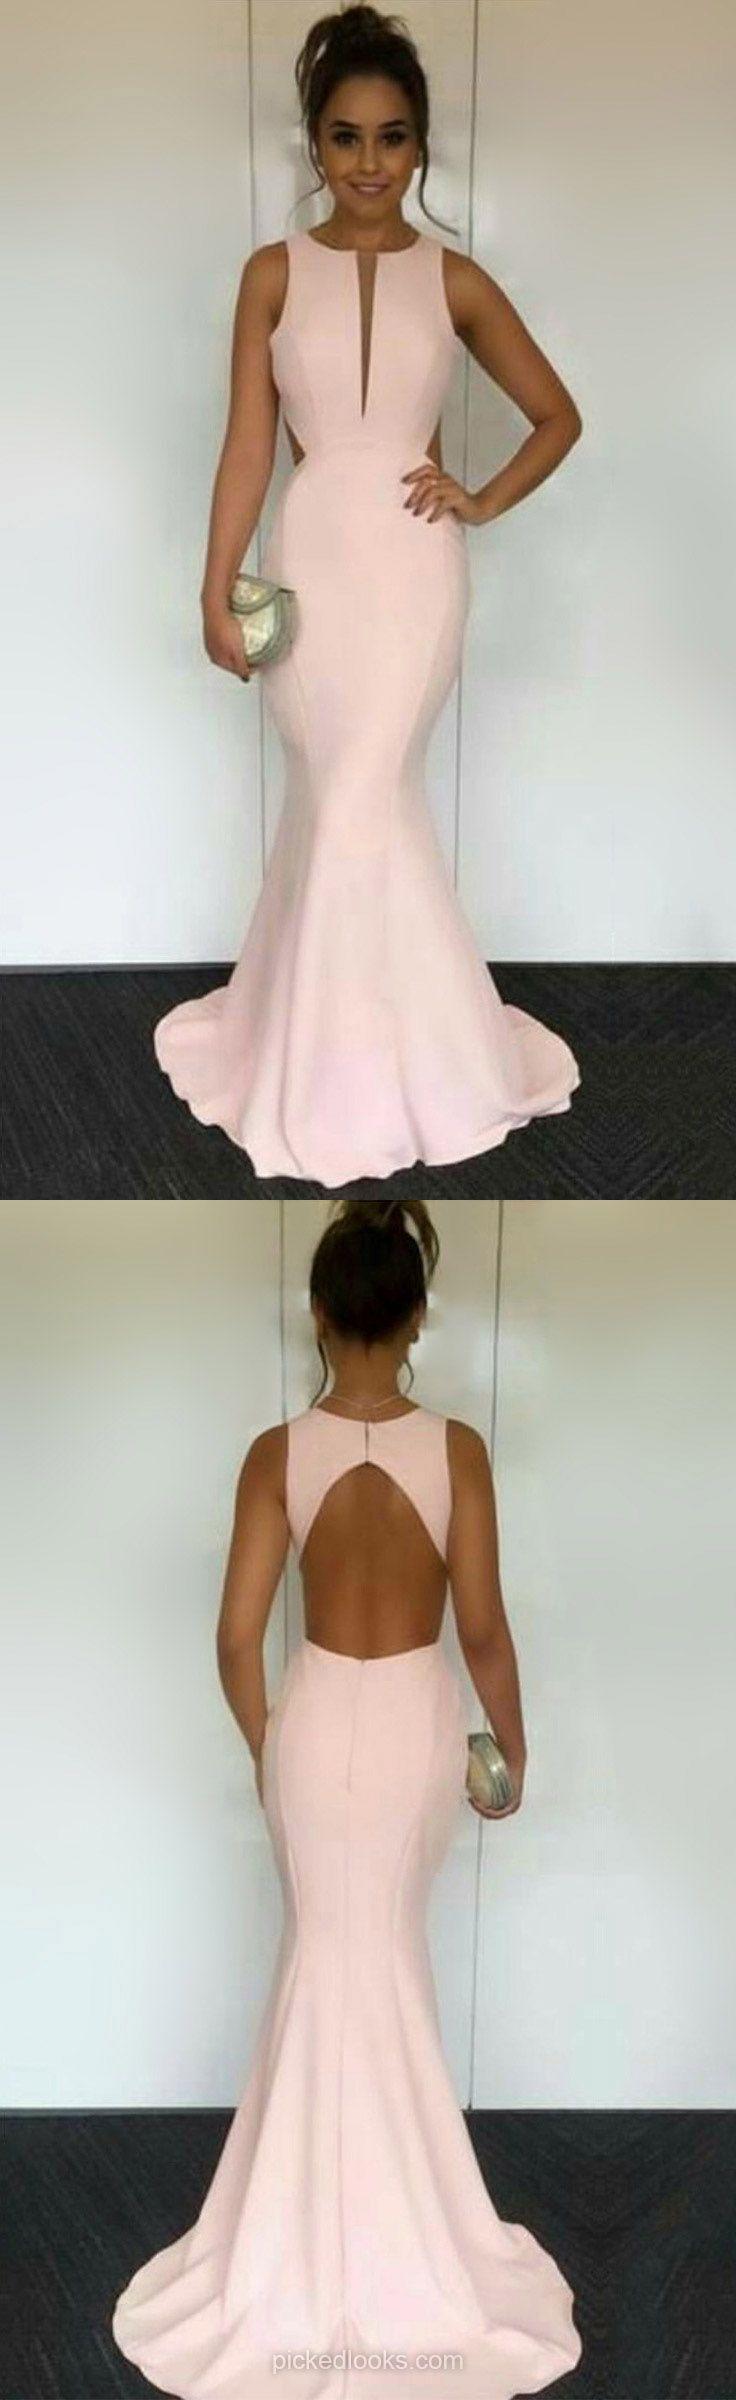 Long ball dresses pink mermaid prom dresses silklike evening